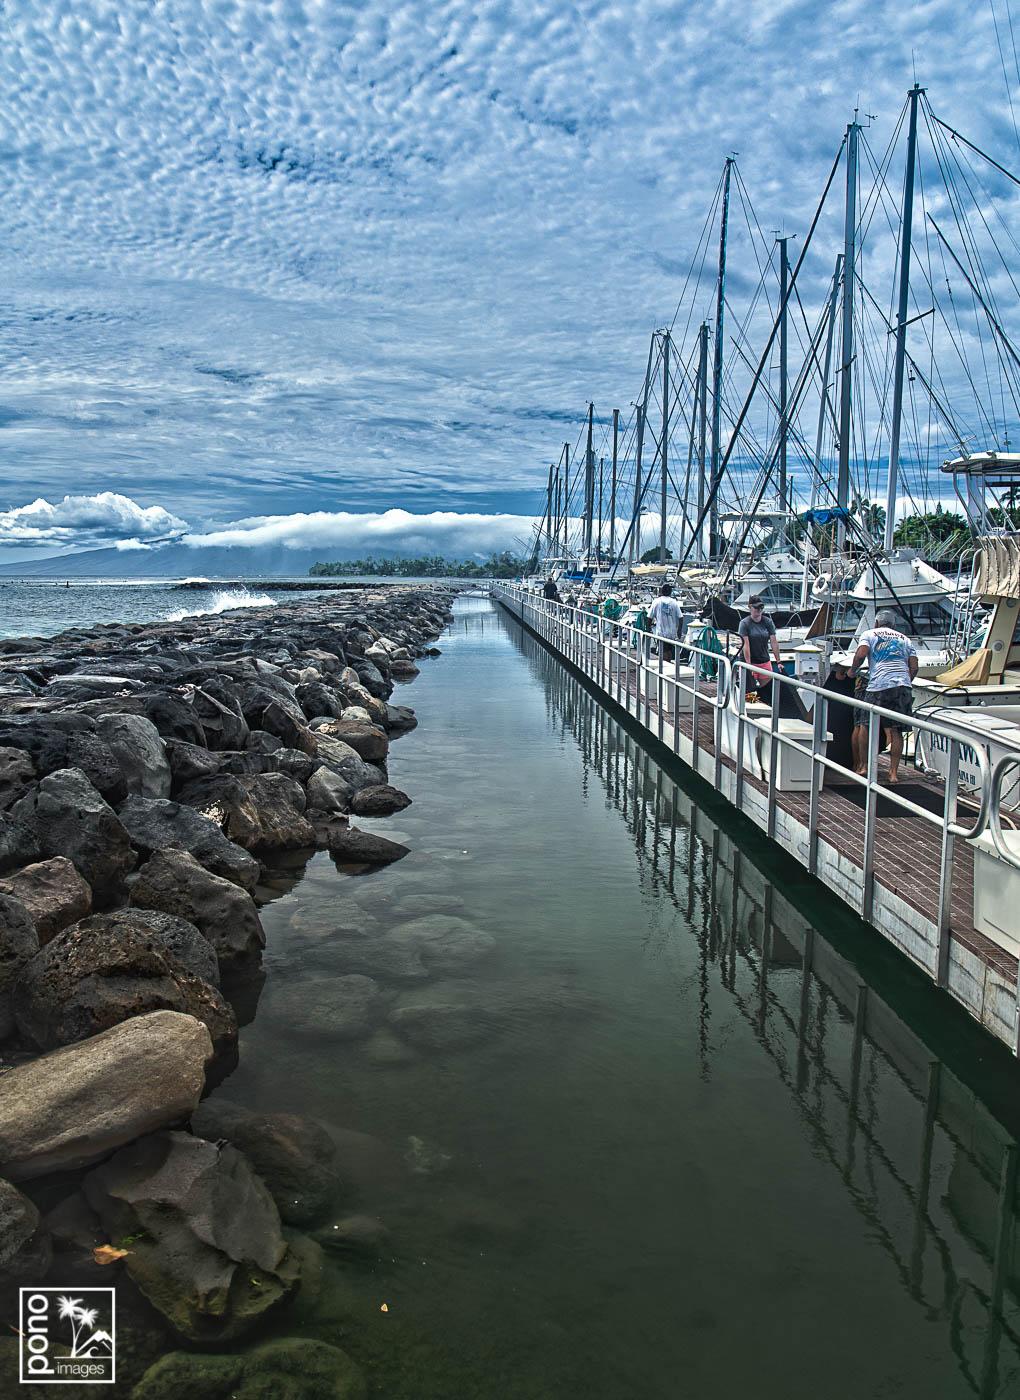 Harbor Afternoon, Lahaina Maui | Pono Images